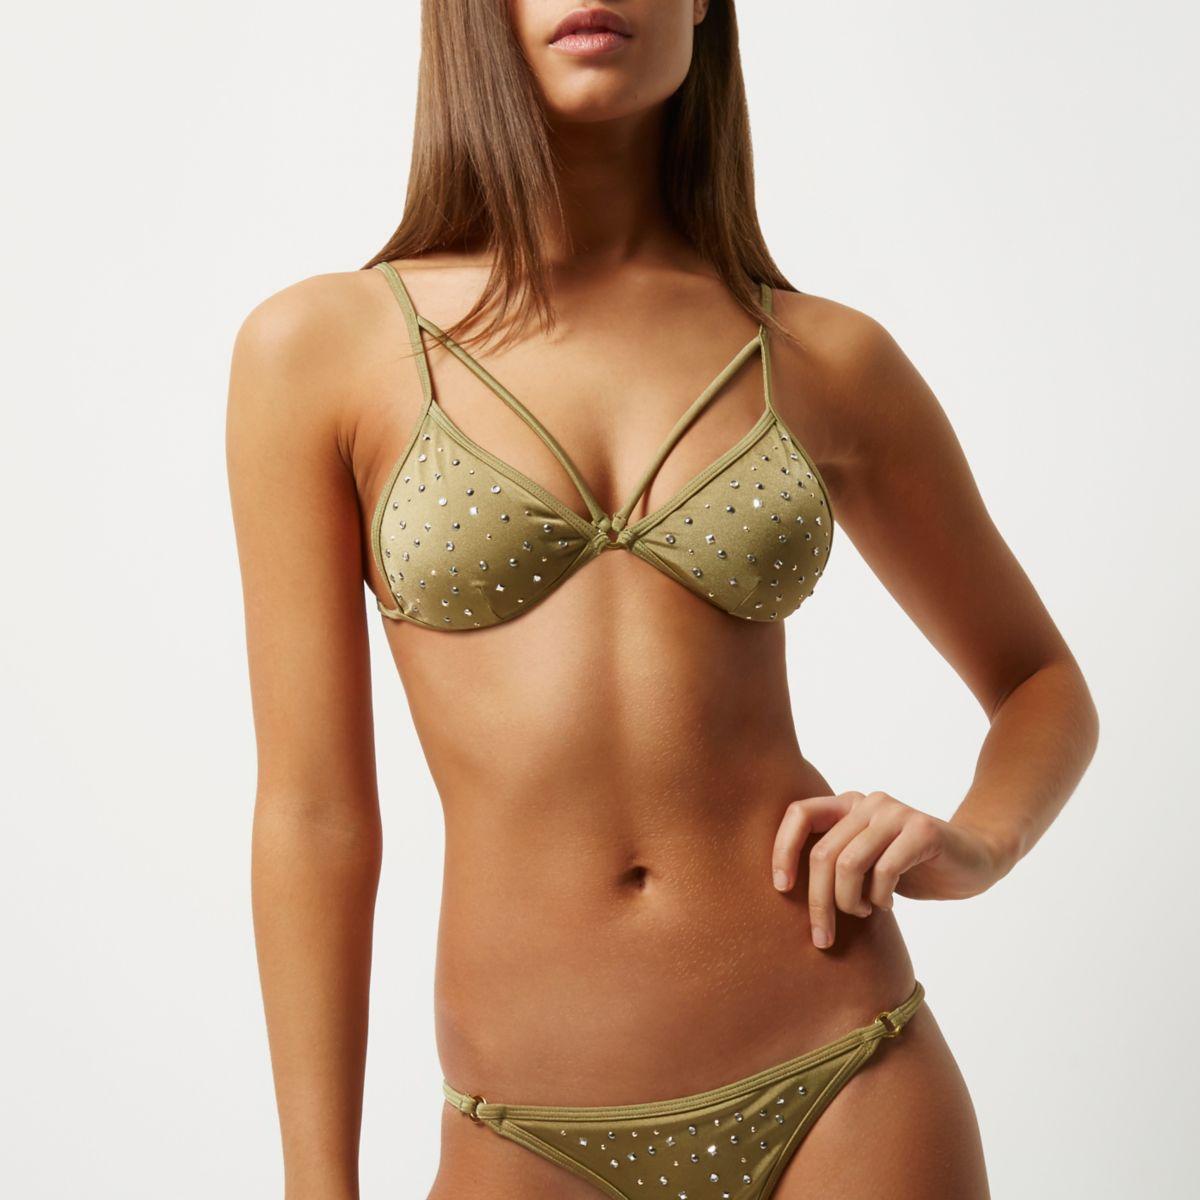 Haut de bikini clouté vert kaki à bretelles